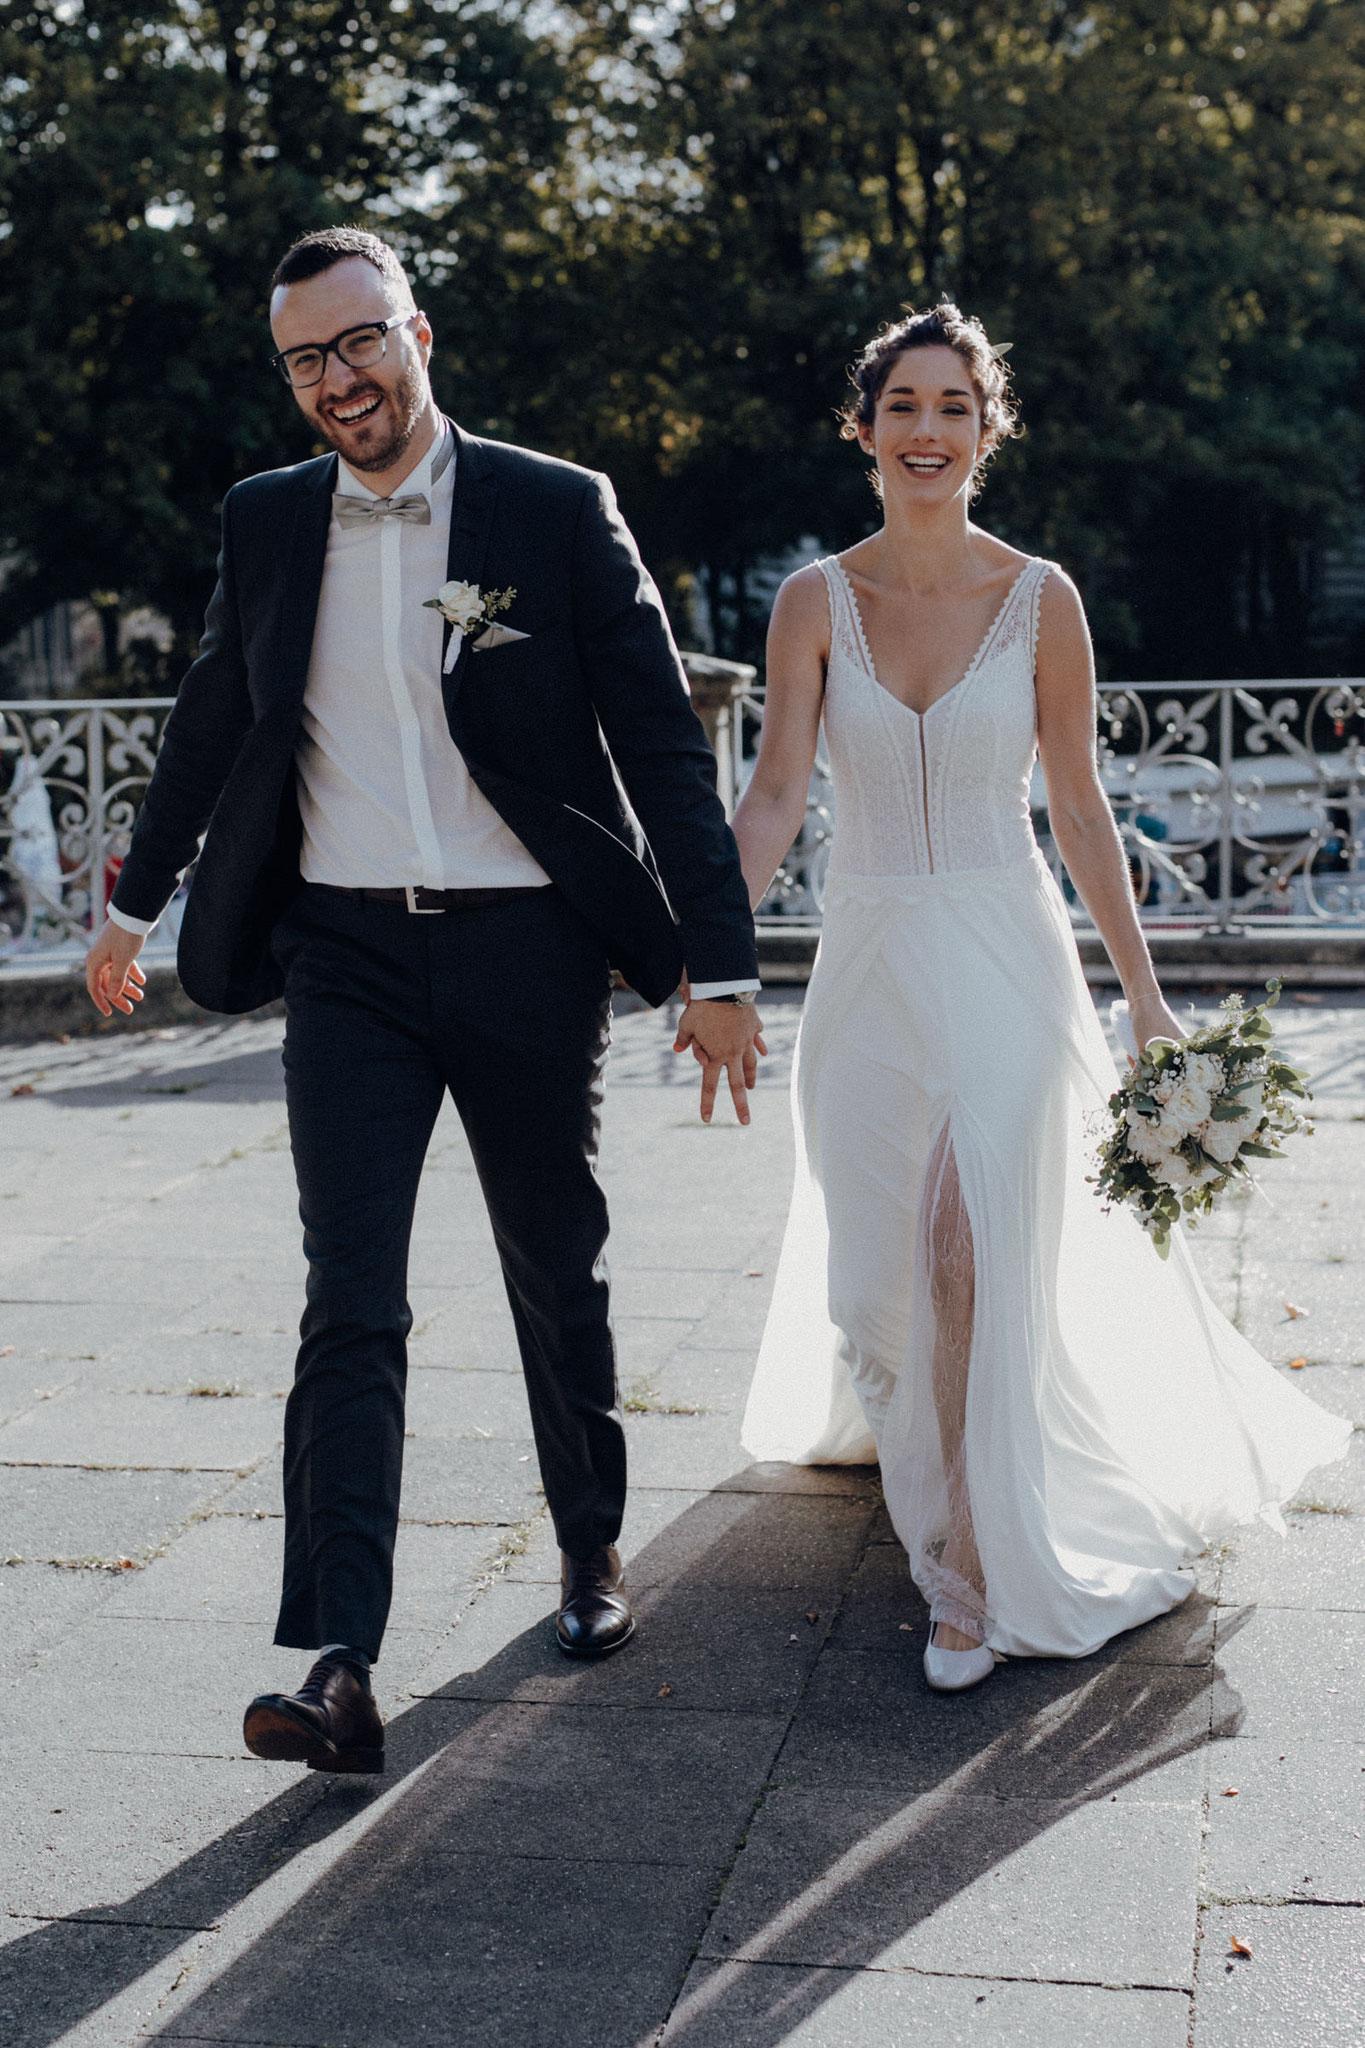 Hochzeitsfotograf Hamburg Alina Atzler